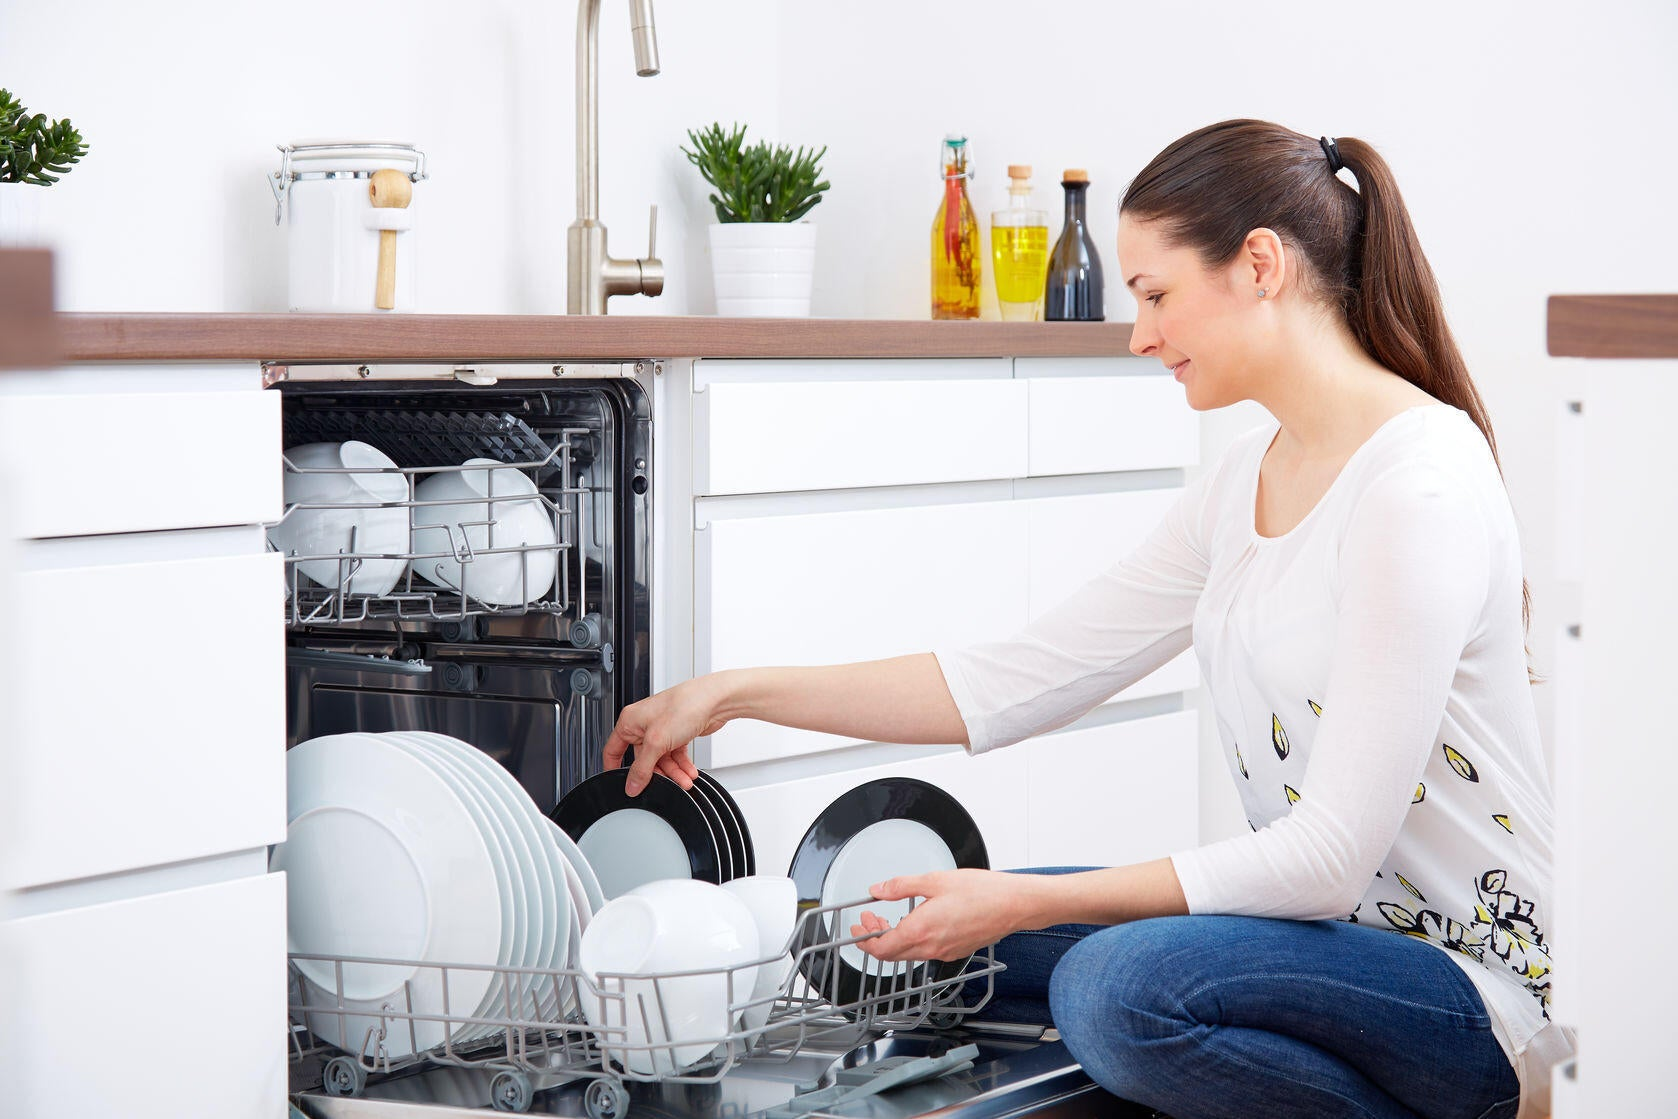 Woman unloading dishwasher